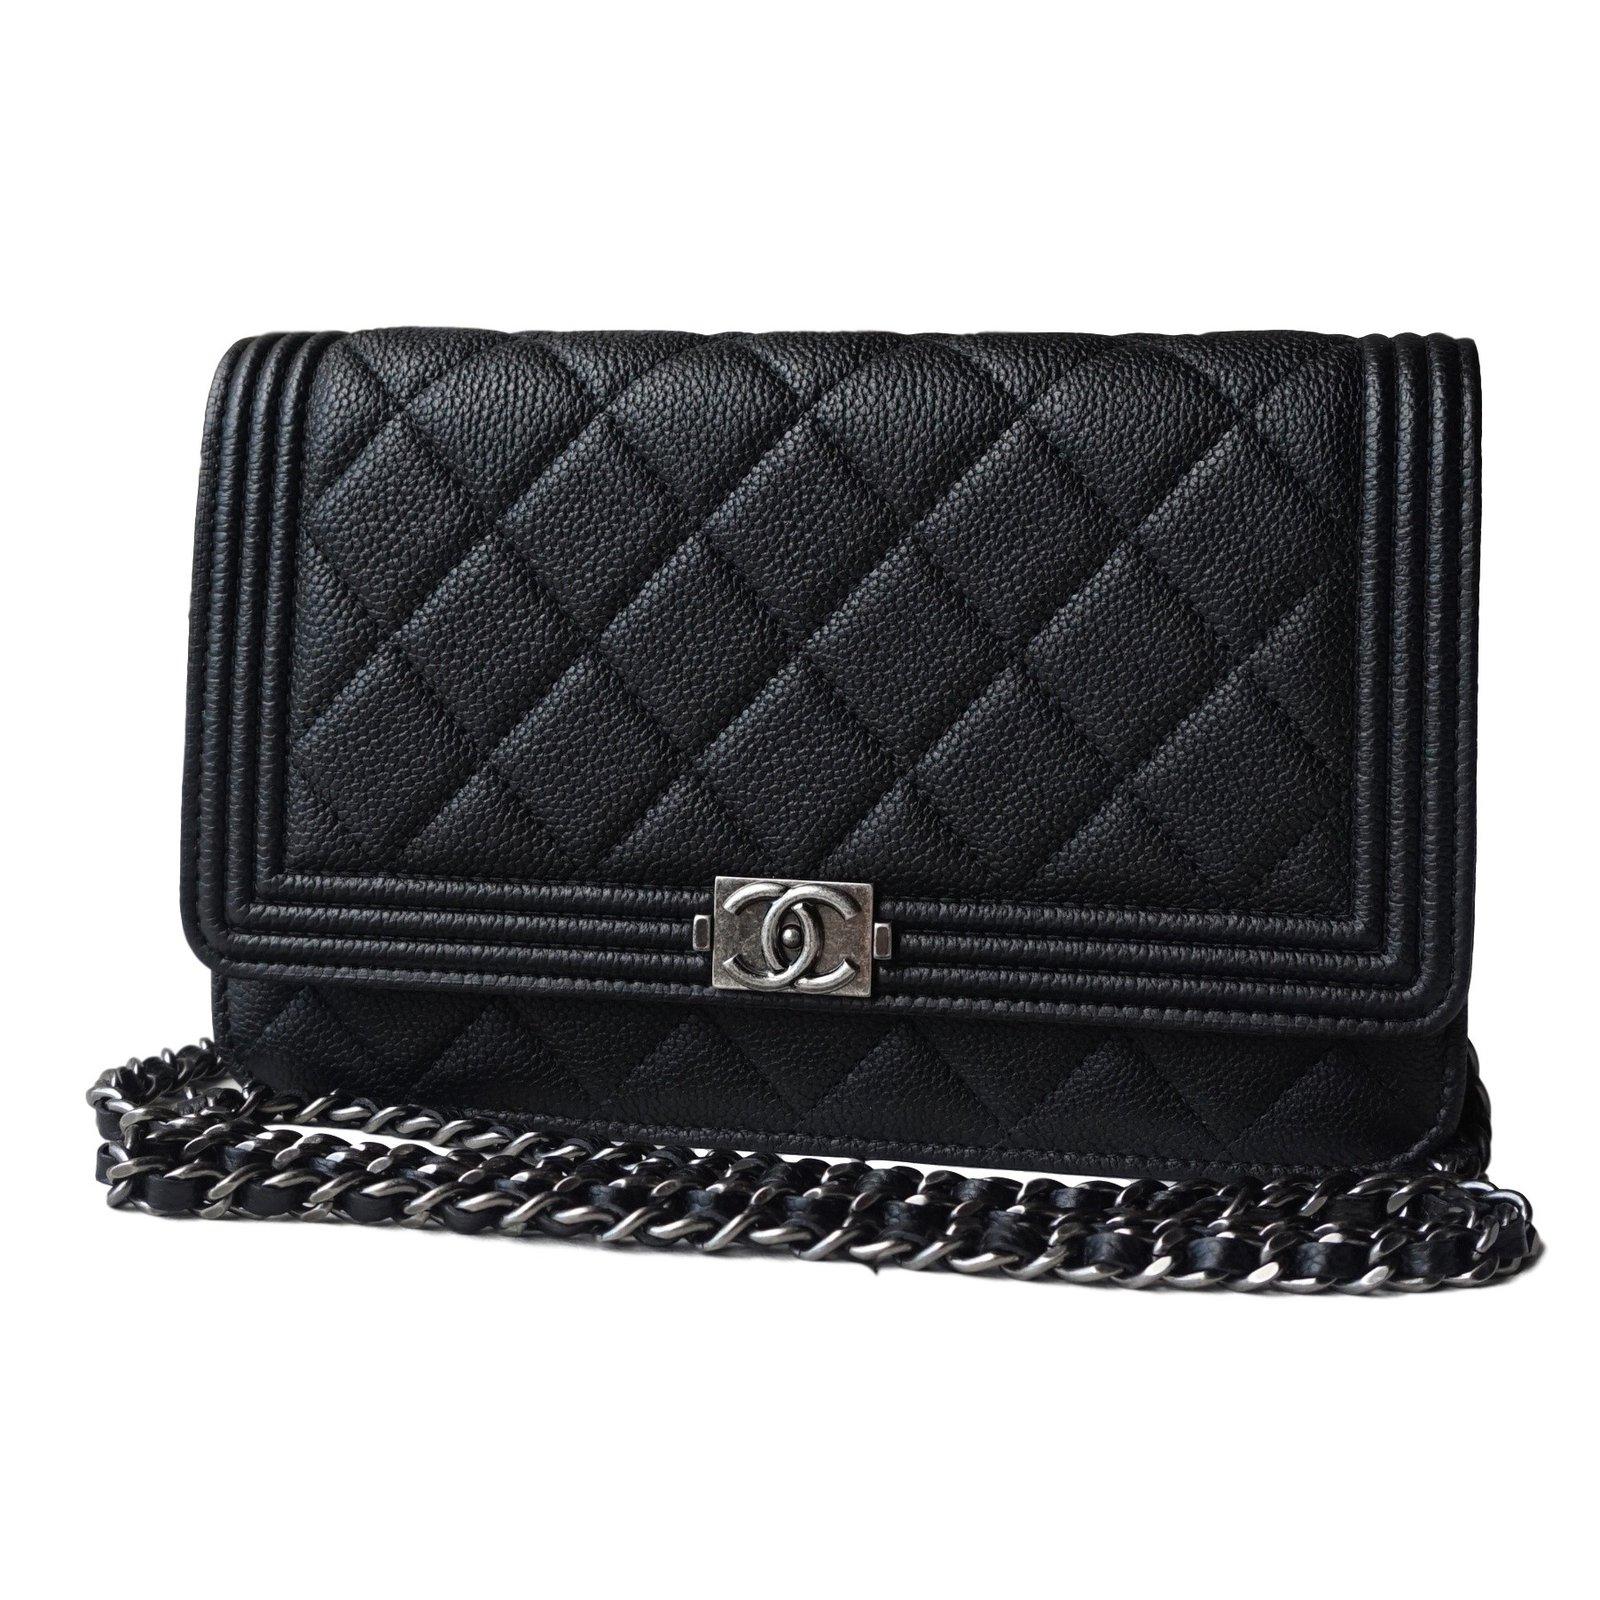 Chanel Boy Woc Handbags Leather Black Ref 21279 Joli Closet